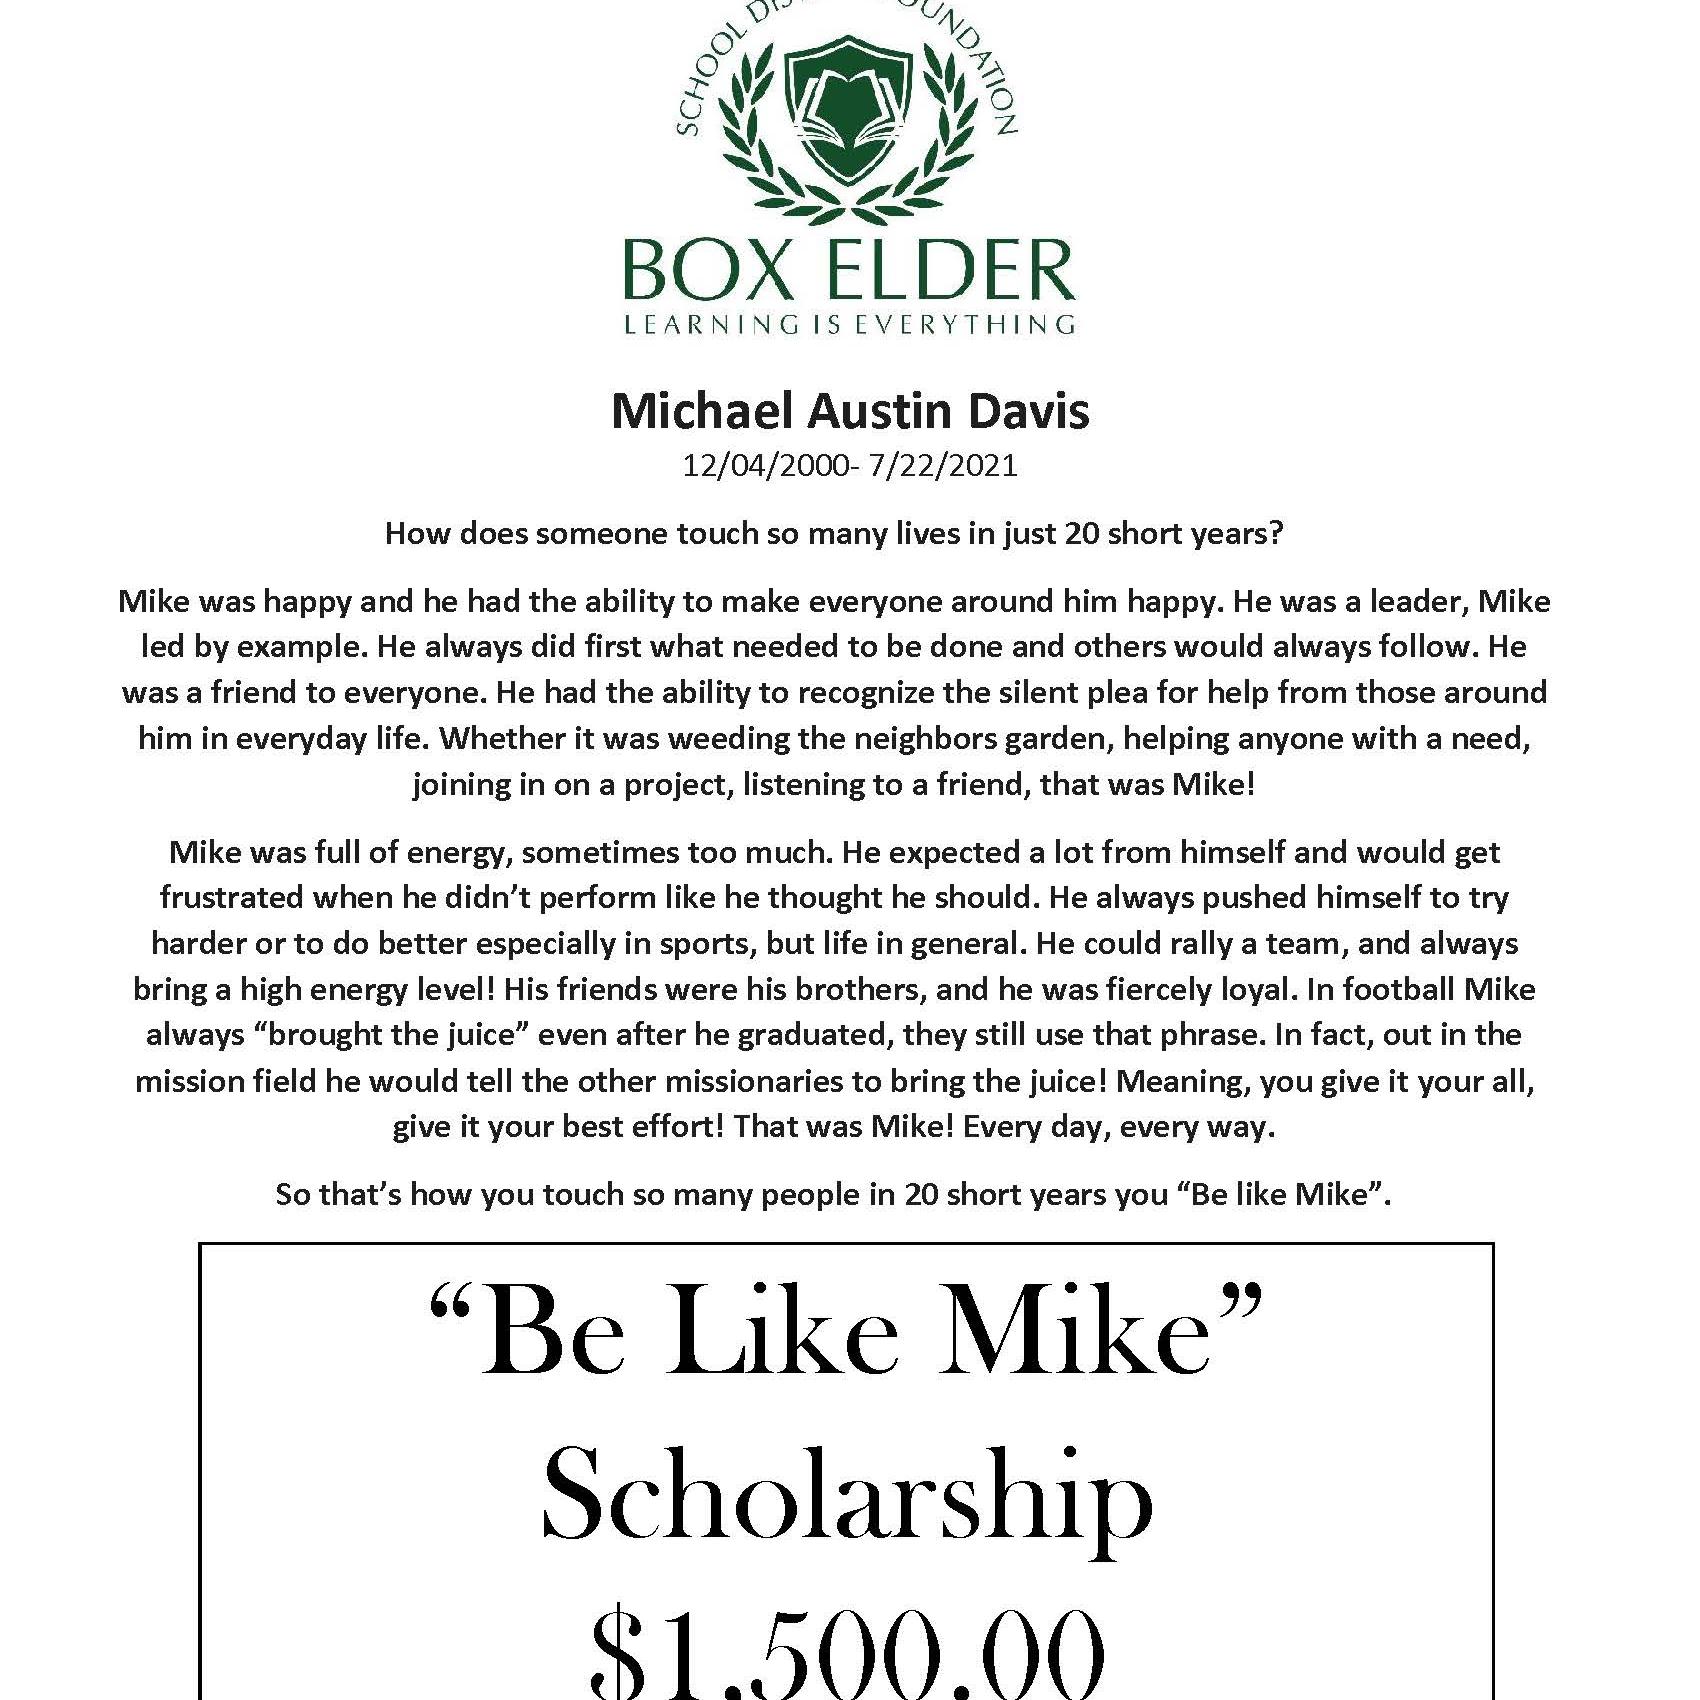 """Be Like Mike"" Scholarship"